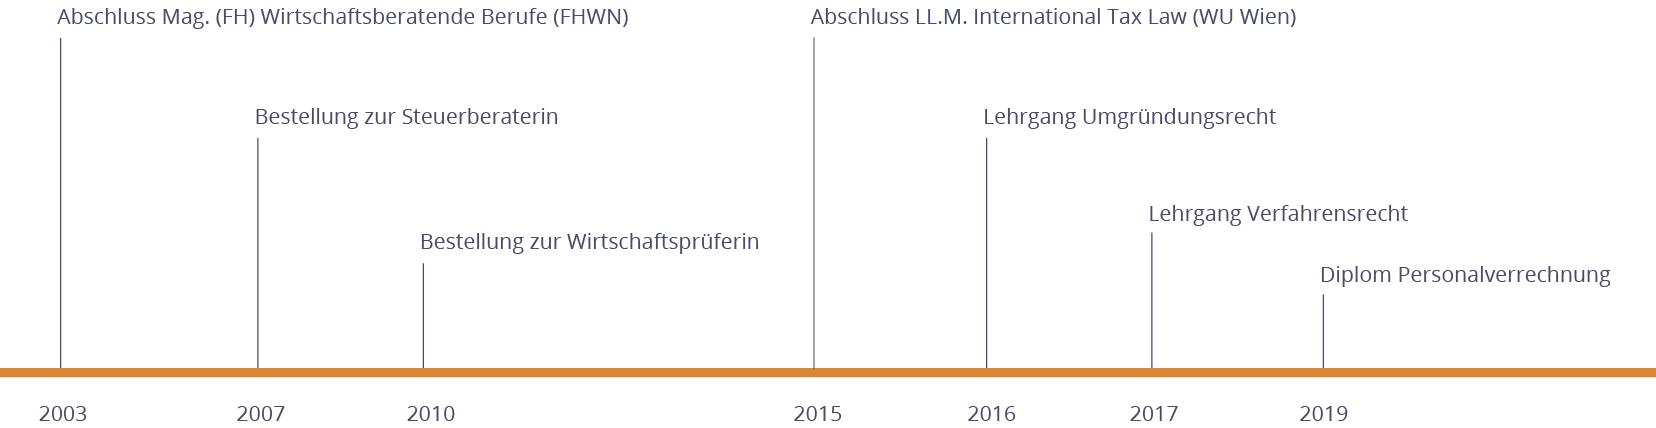 DieSteuerberaterin.wien | Alexandra Kaspar - Timeline